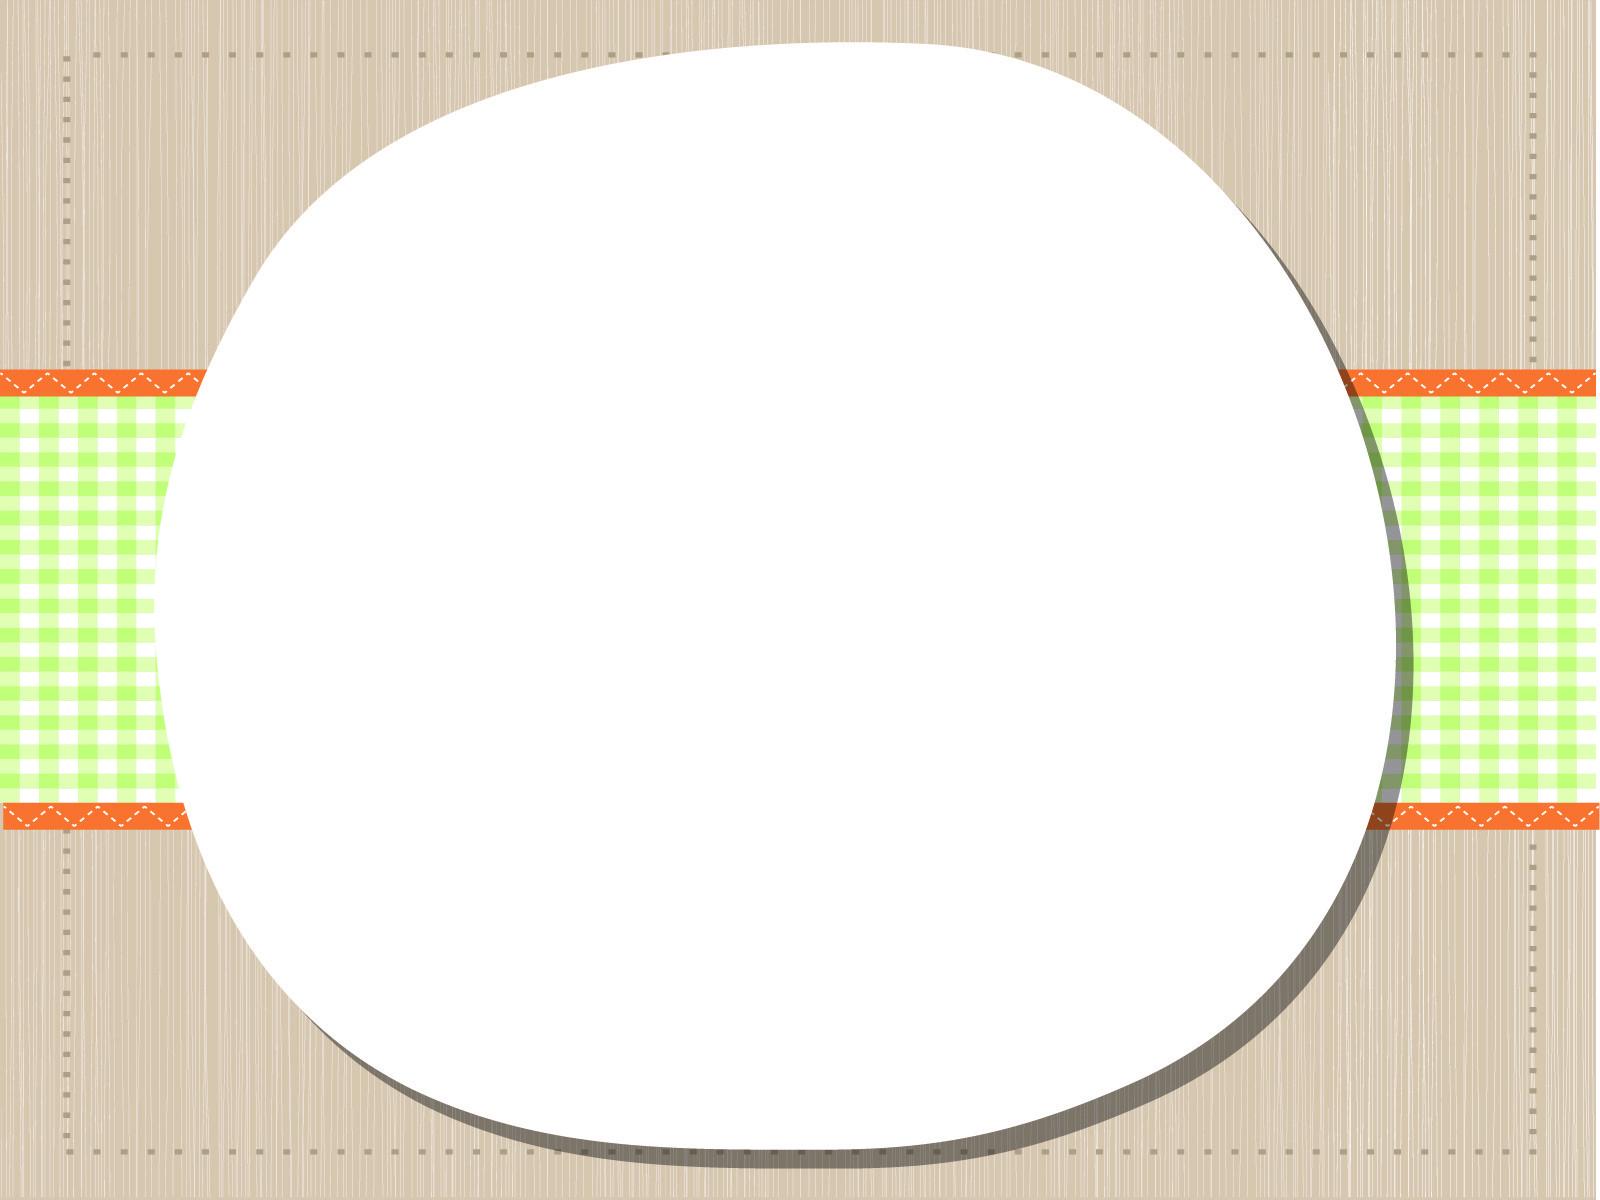 Board Pattern PPT Backgrounds